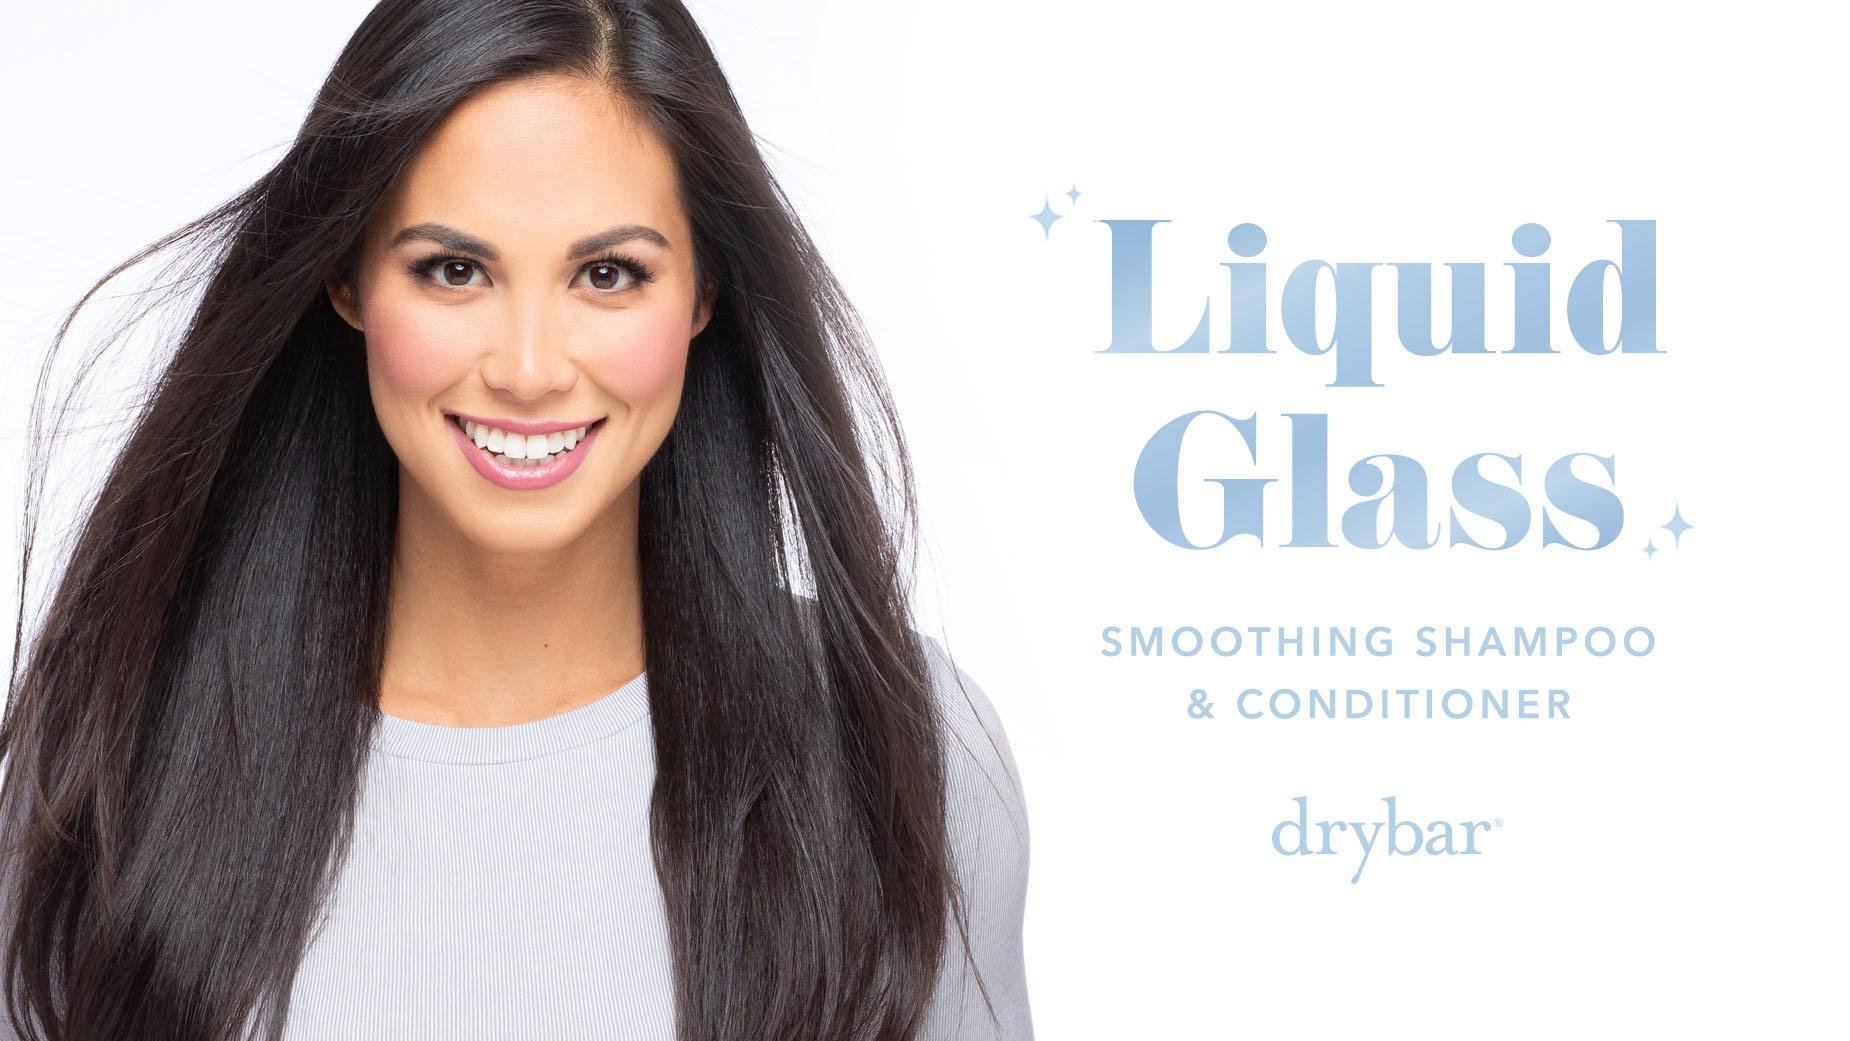 Liquid Glass Smoothing Shampoo & Conditioner Video